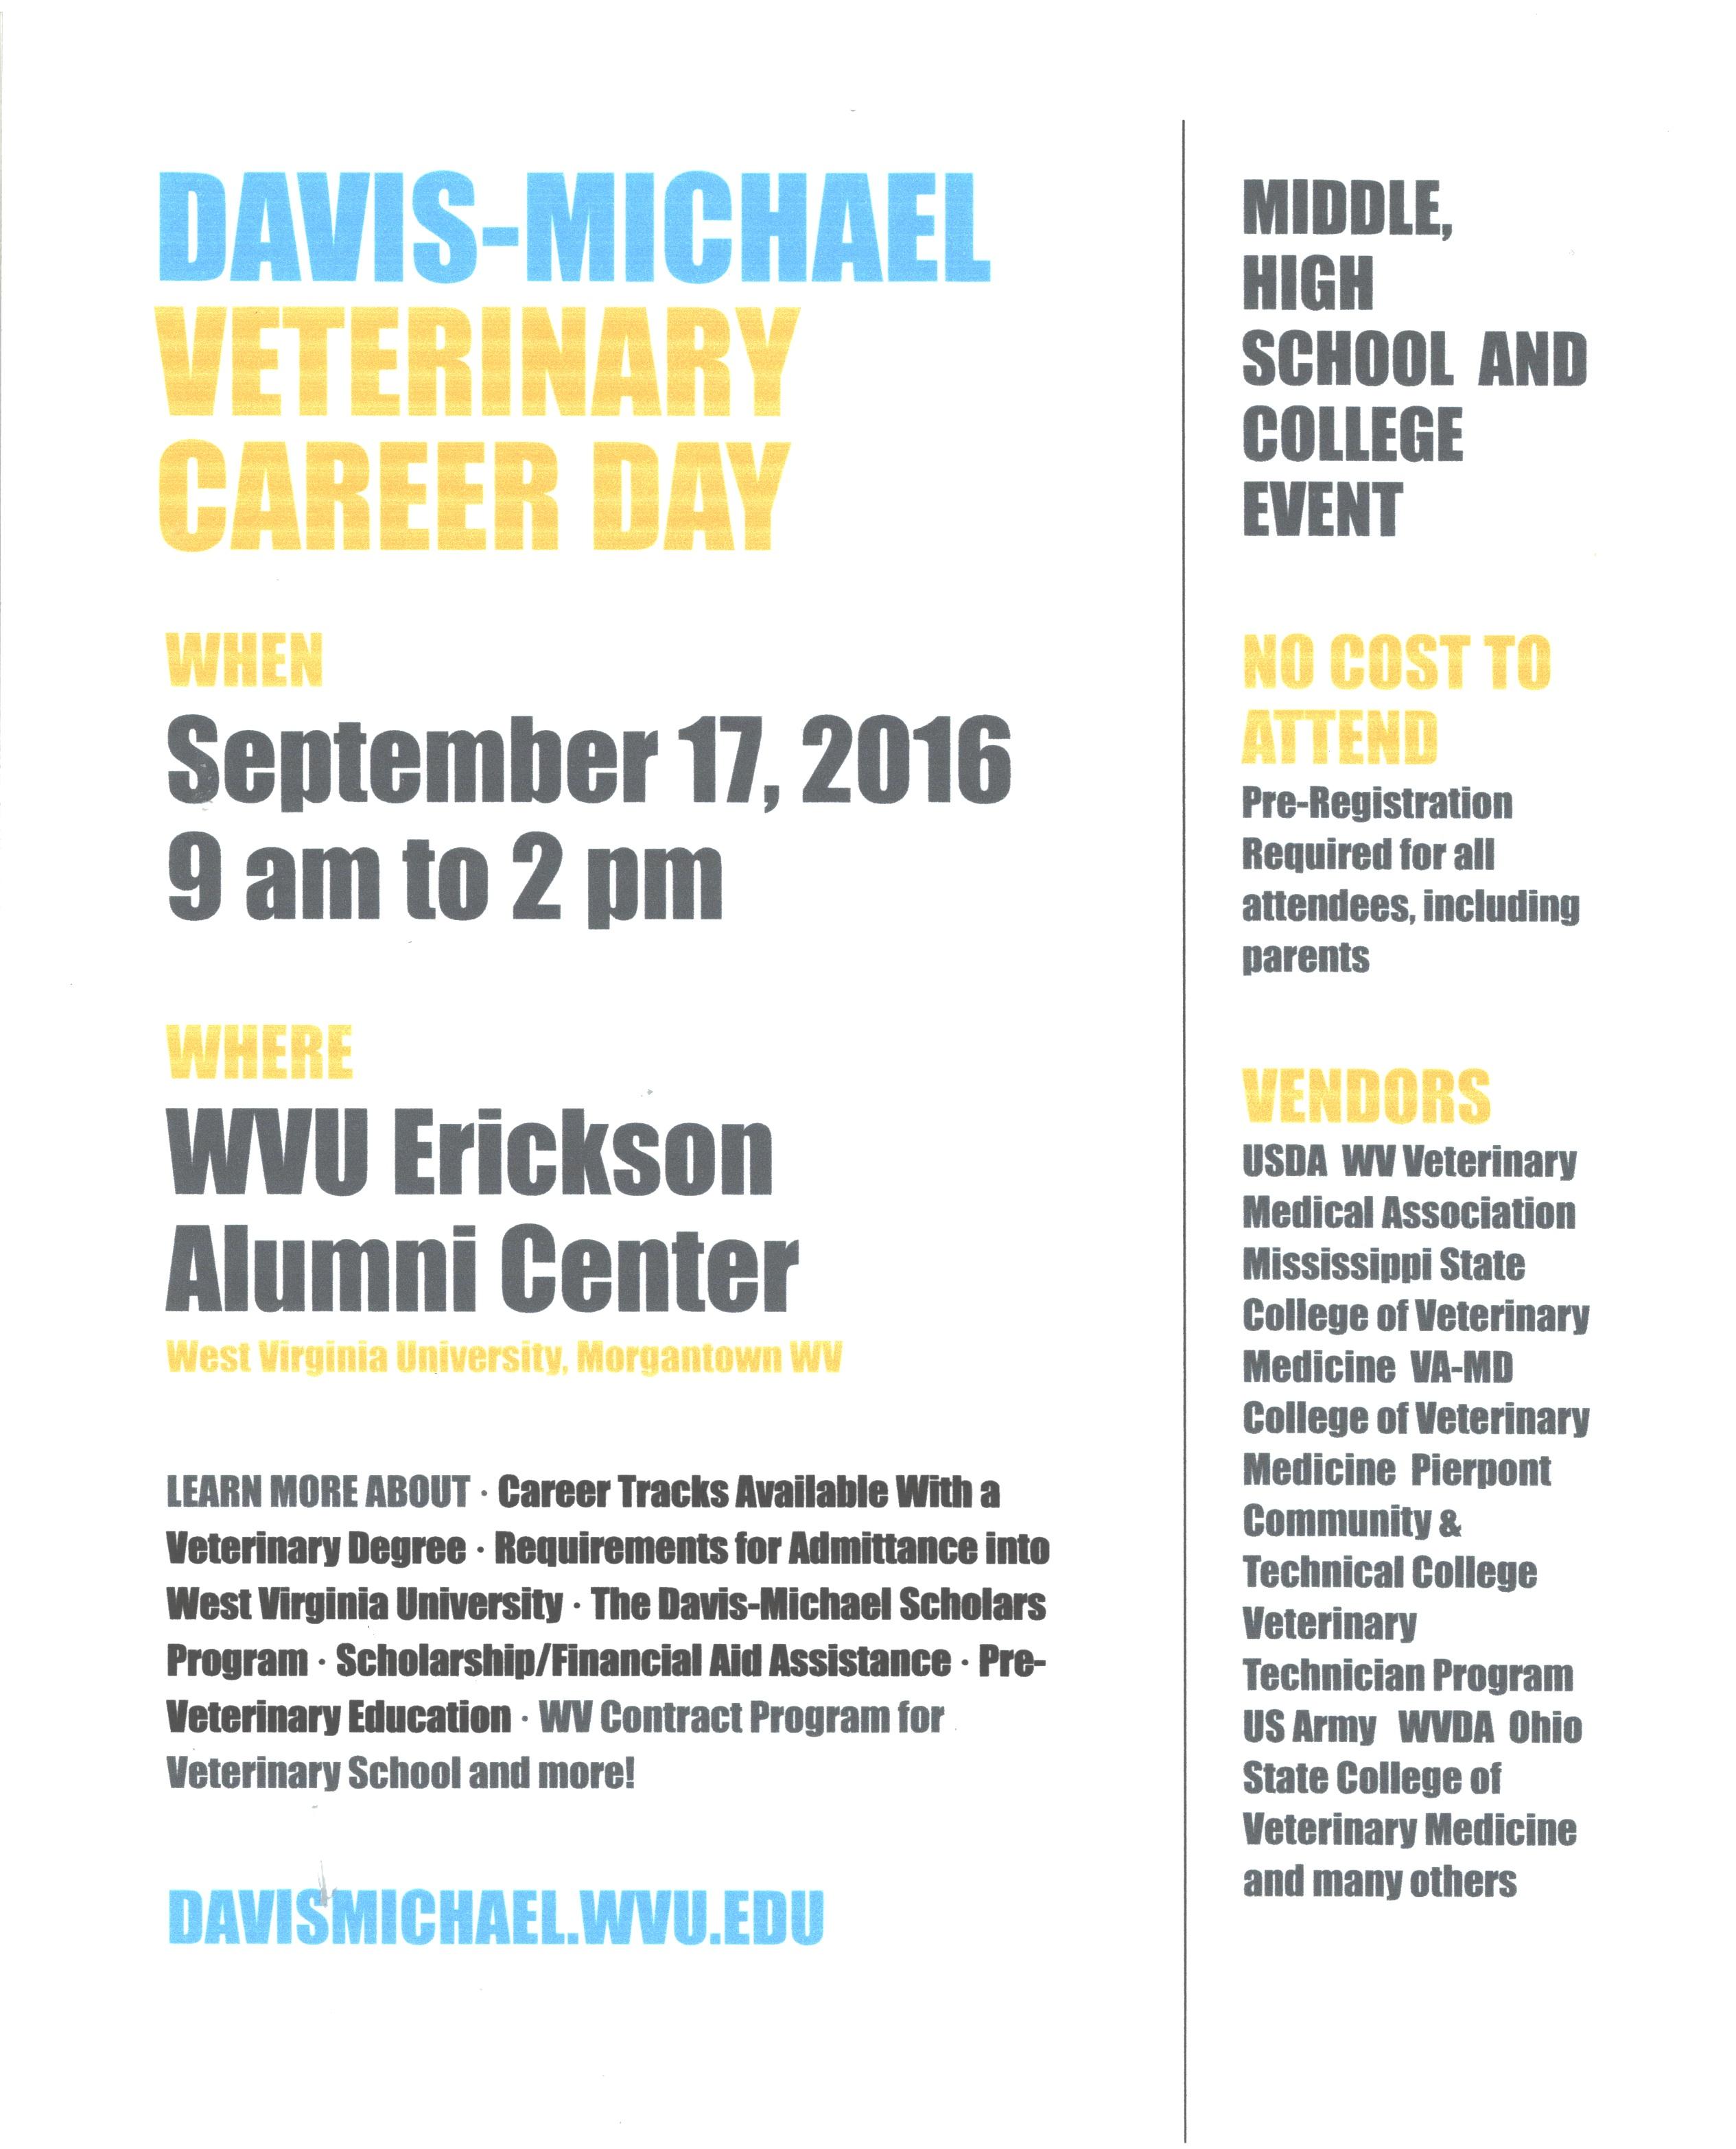 Davis-Michael Veterinary Career Day